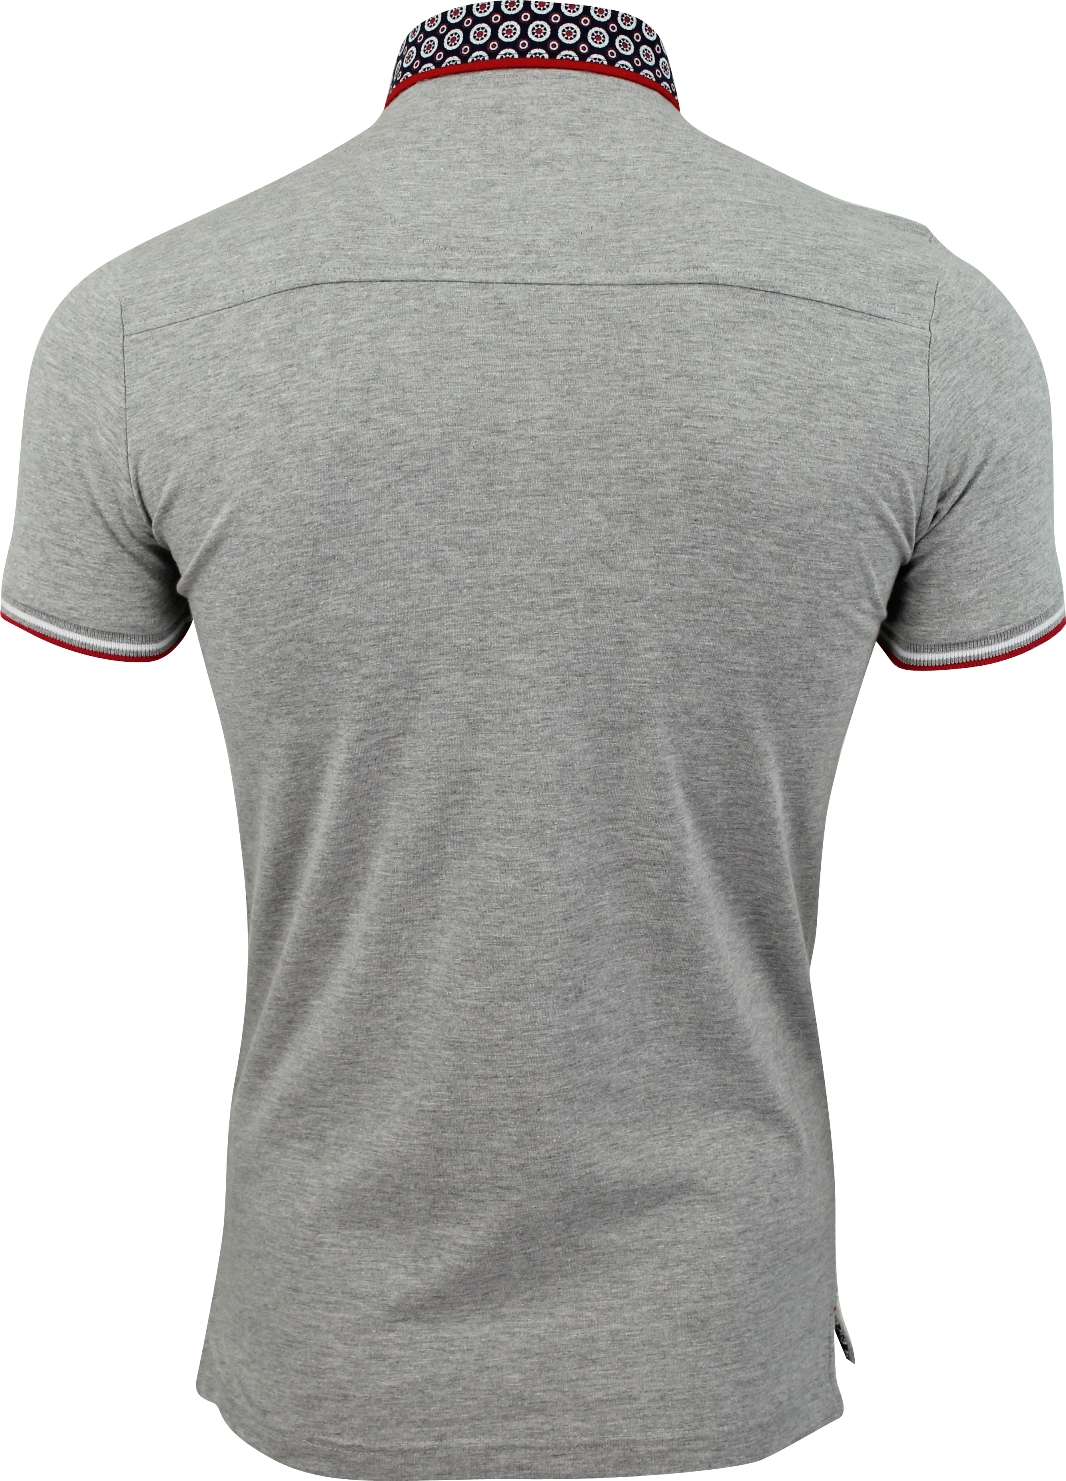 Mens-Polo-T-Shirt-Chimera-Brave-Soul-Denim-Chambray-Collar-Short-Sleeved-Cotton thumbnail 40